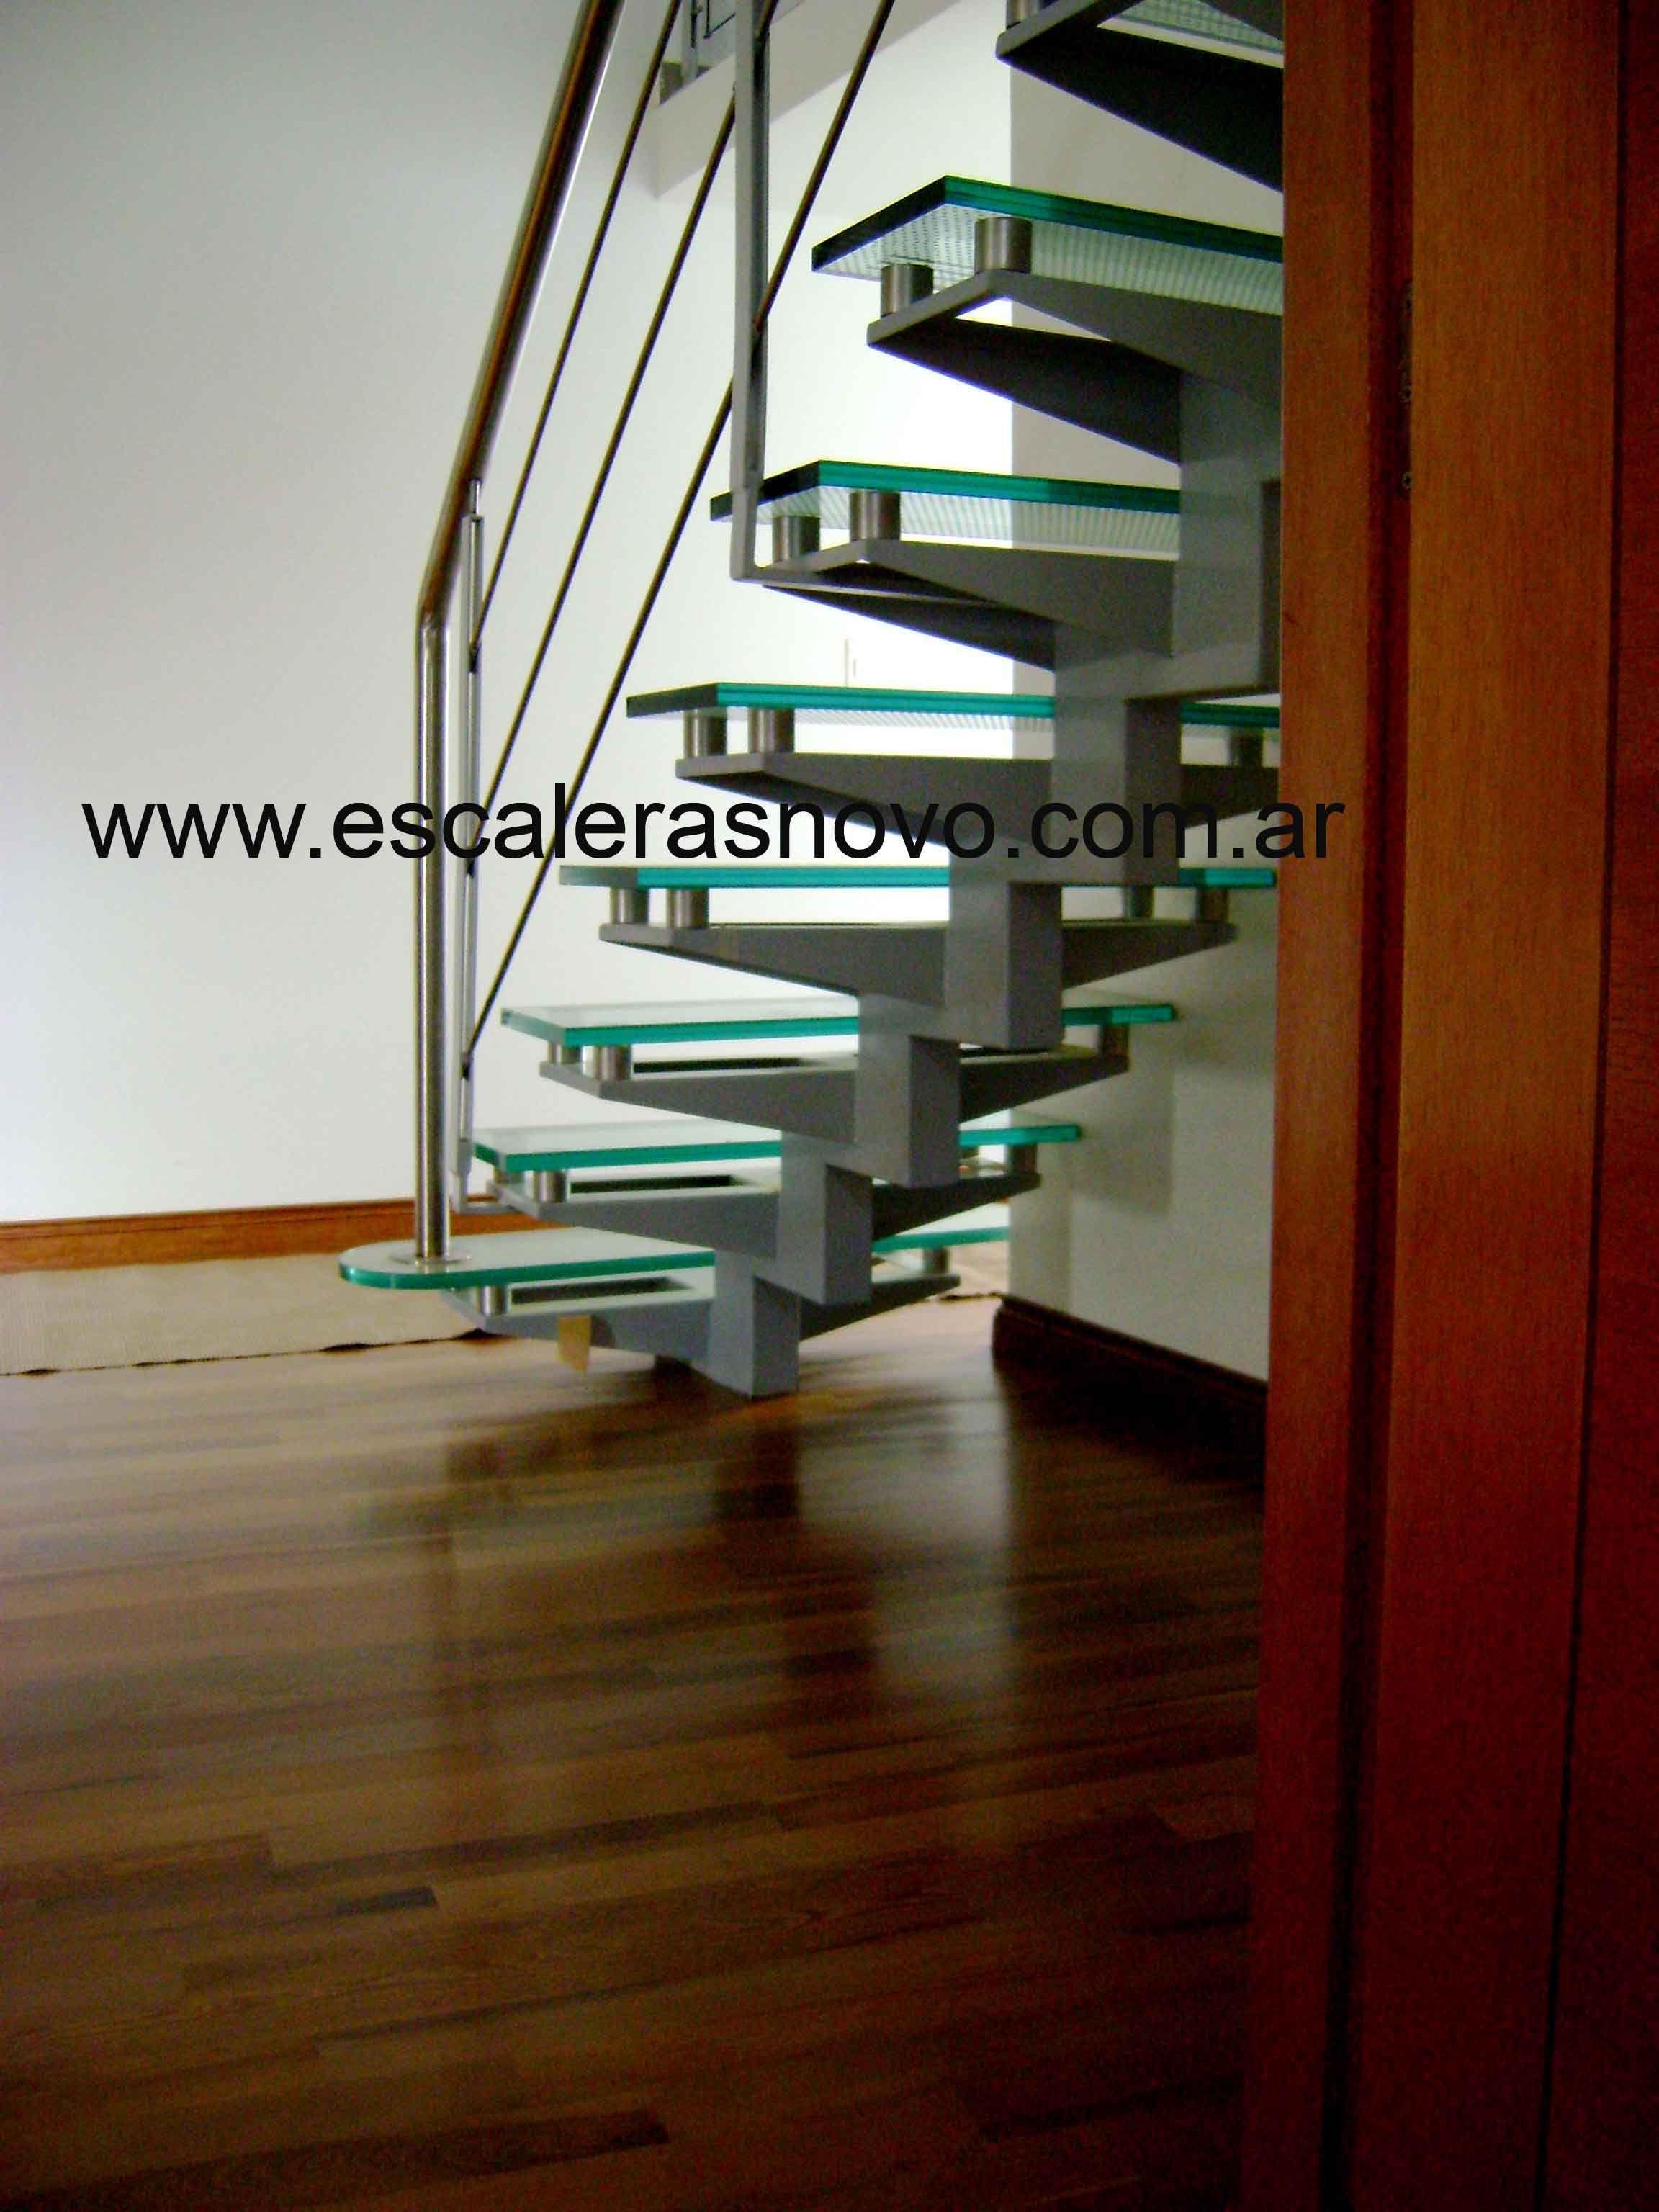 Escaleras De Vidrio Arch Stairs Pinterest Escaleras De  ~ Escaleras Prefabricadas De Madera